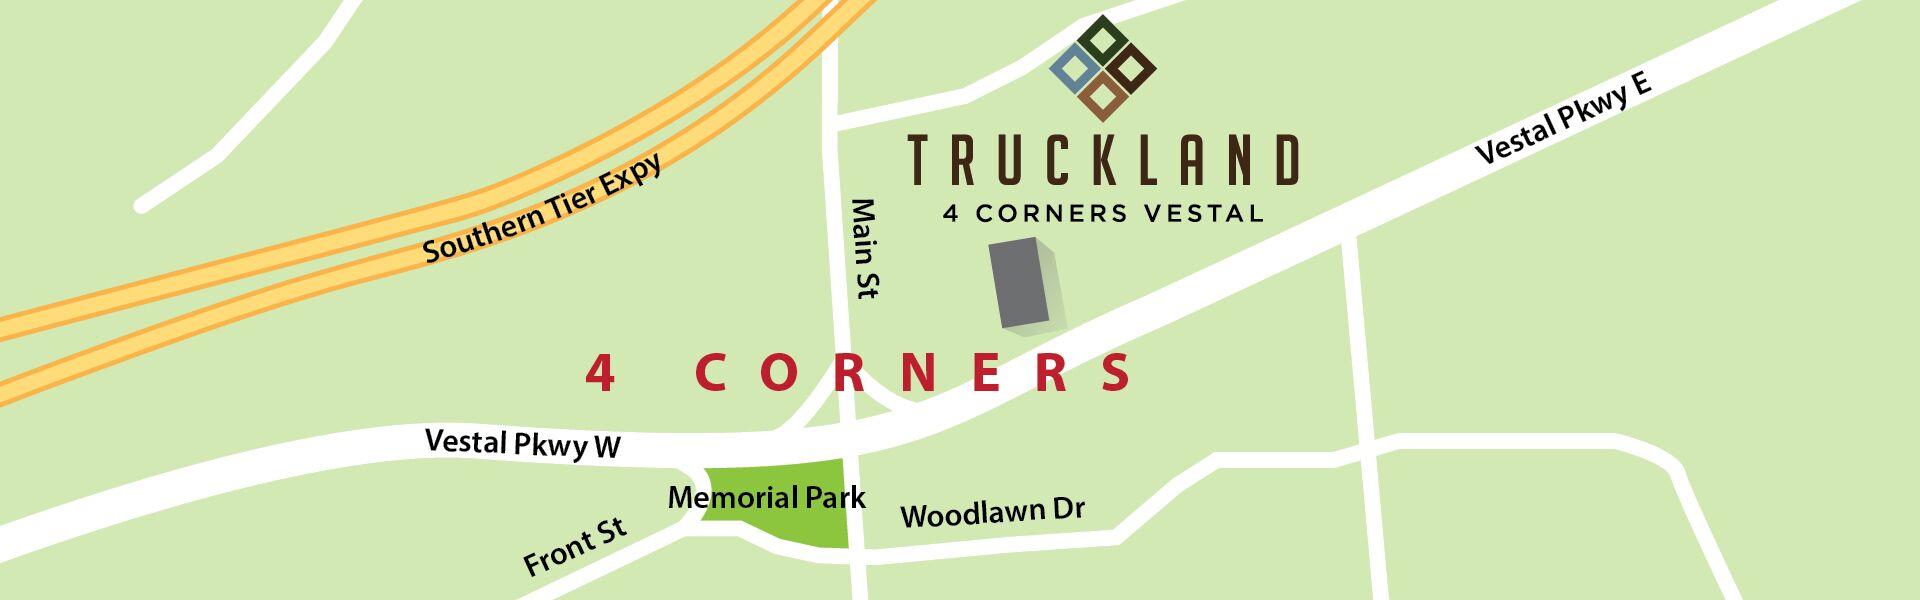 map of Truckland Vestal location